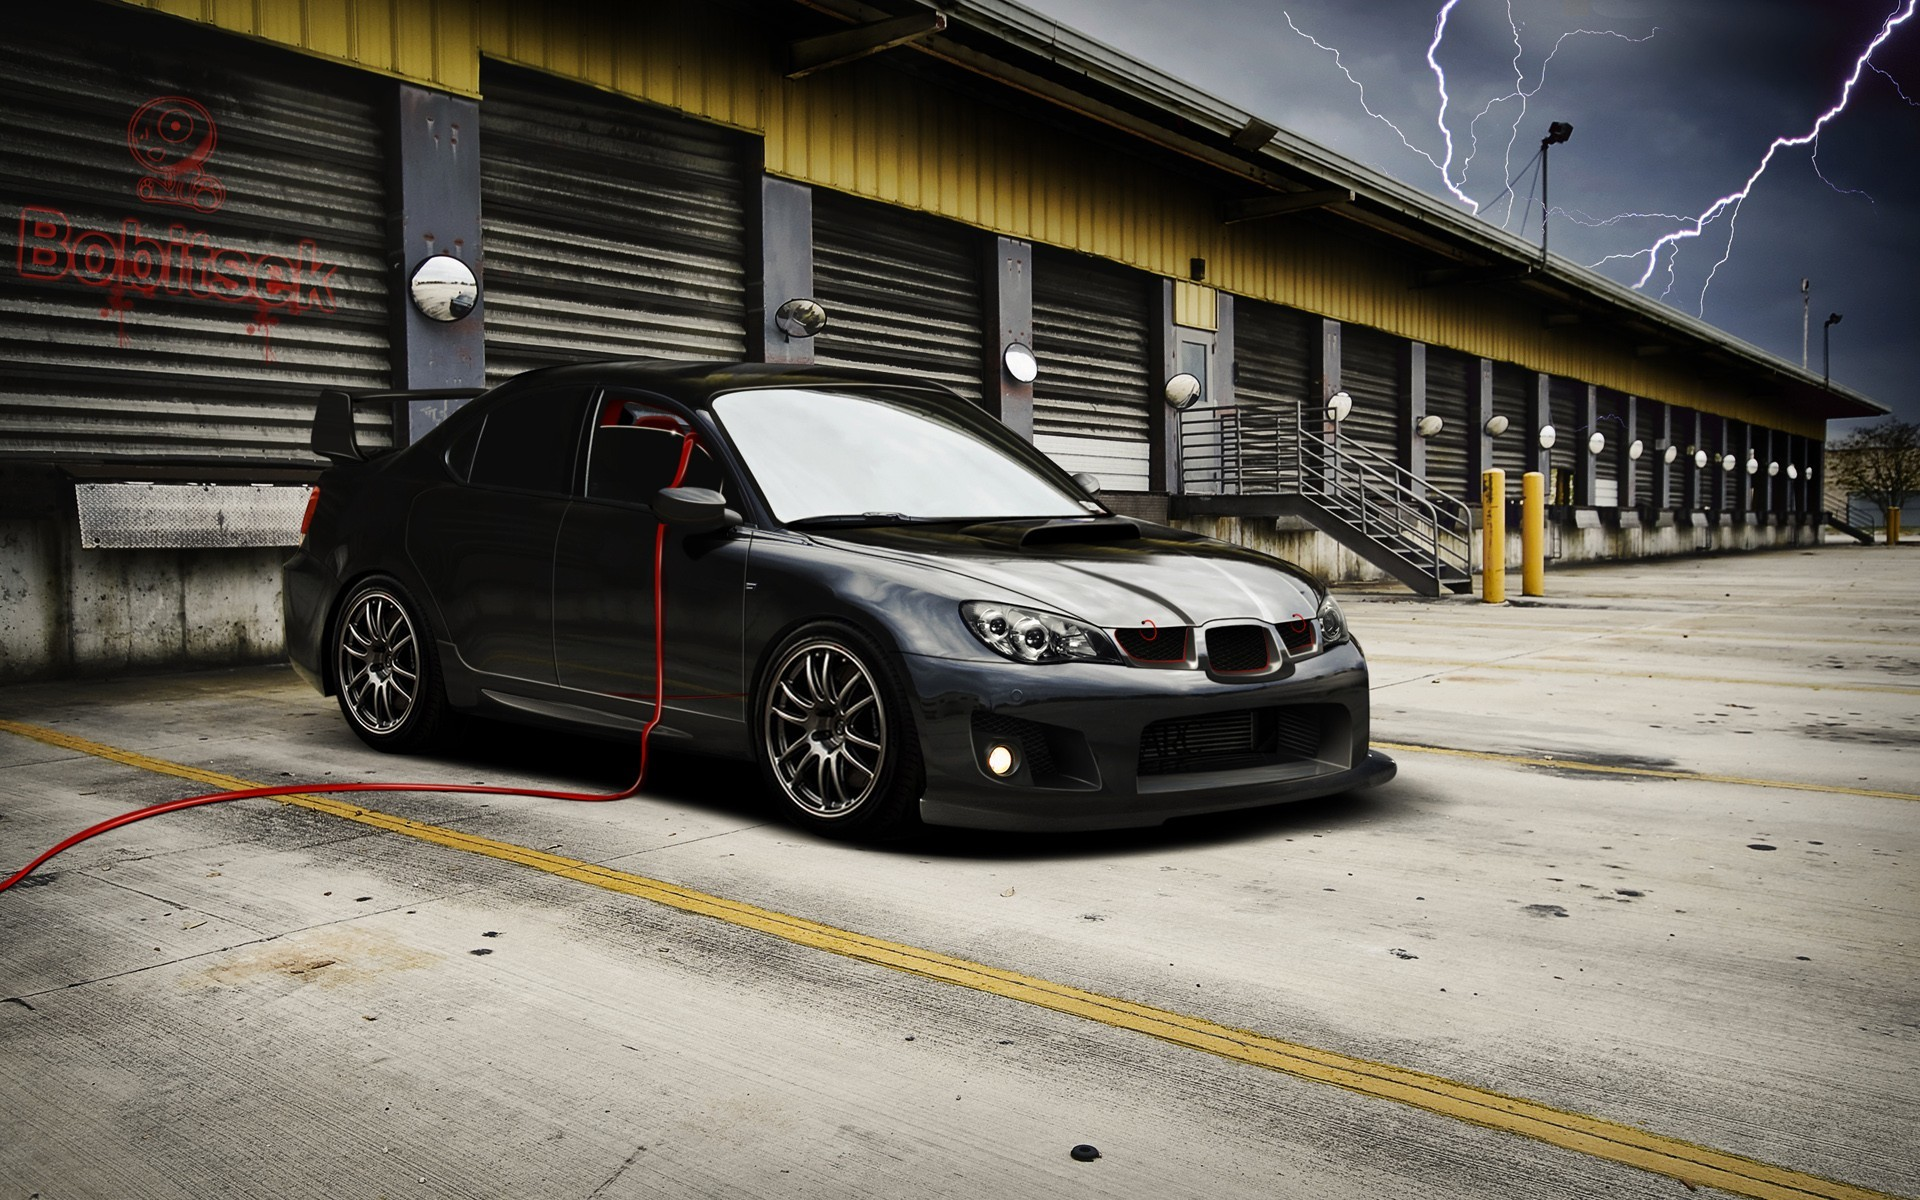 Cars JDM Japanese Domestic Market Subaru Impreza WRX STI Tuning